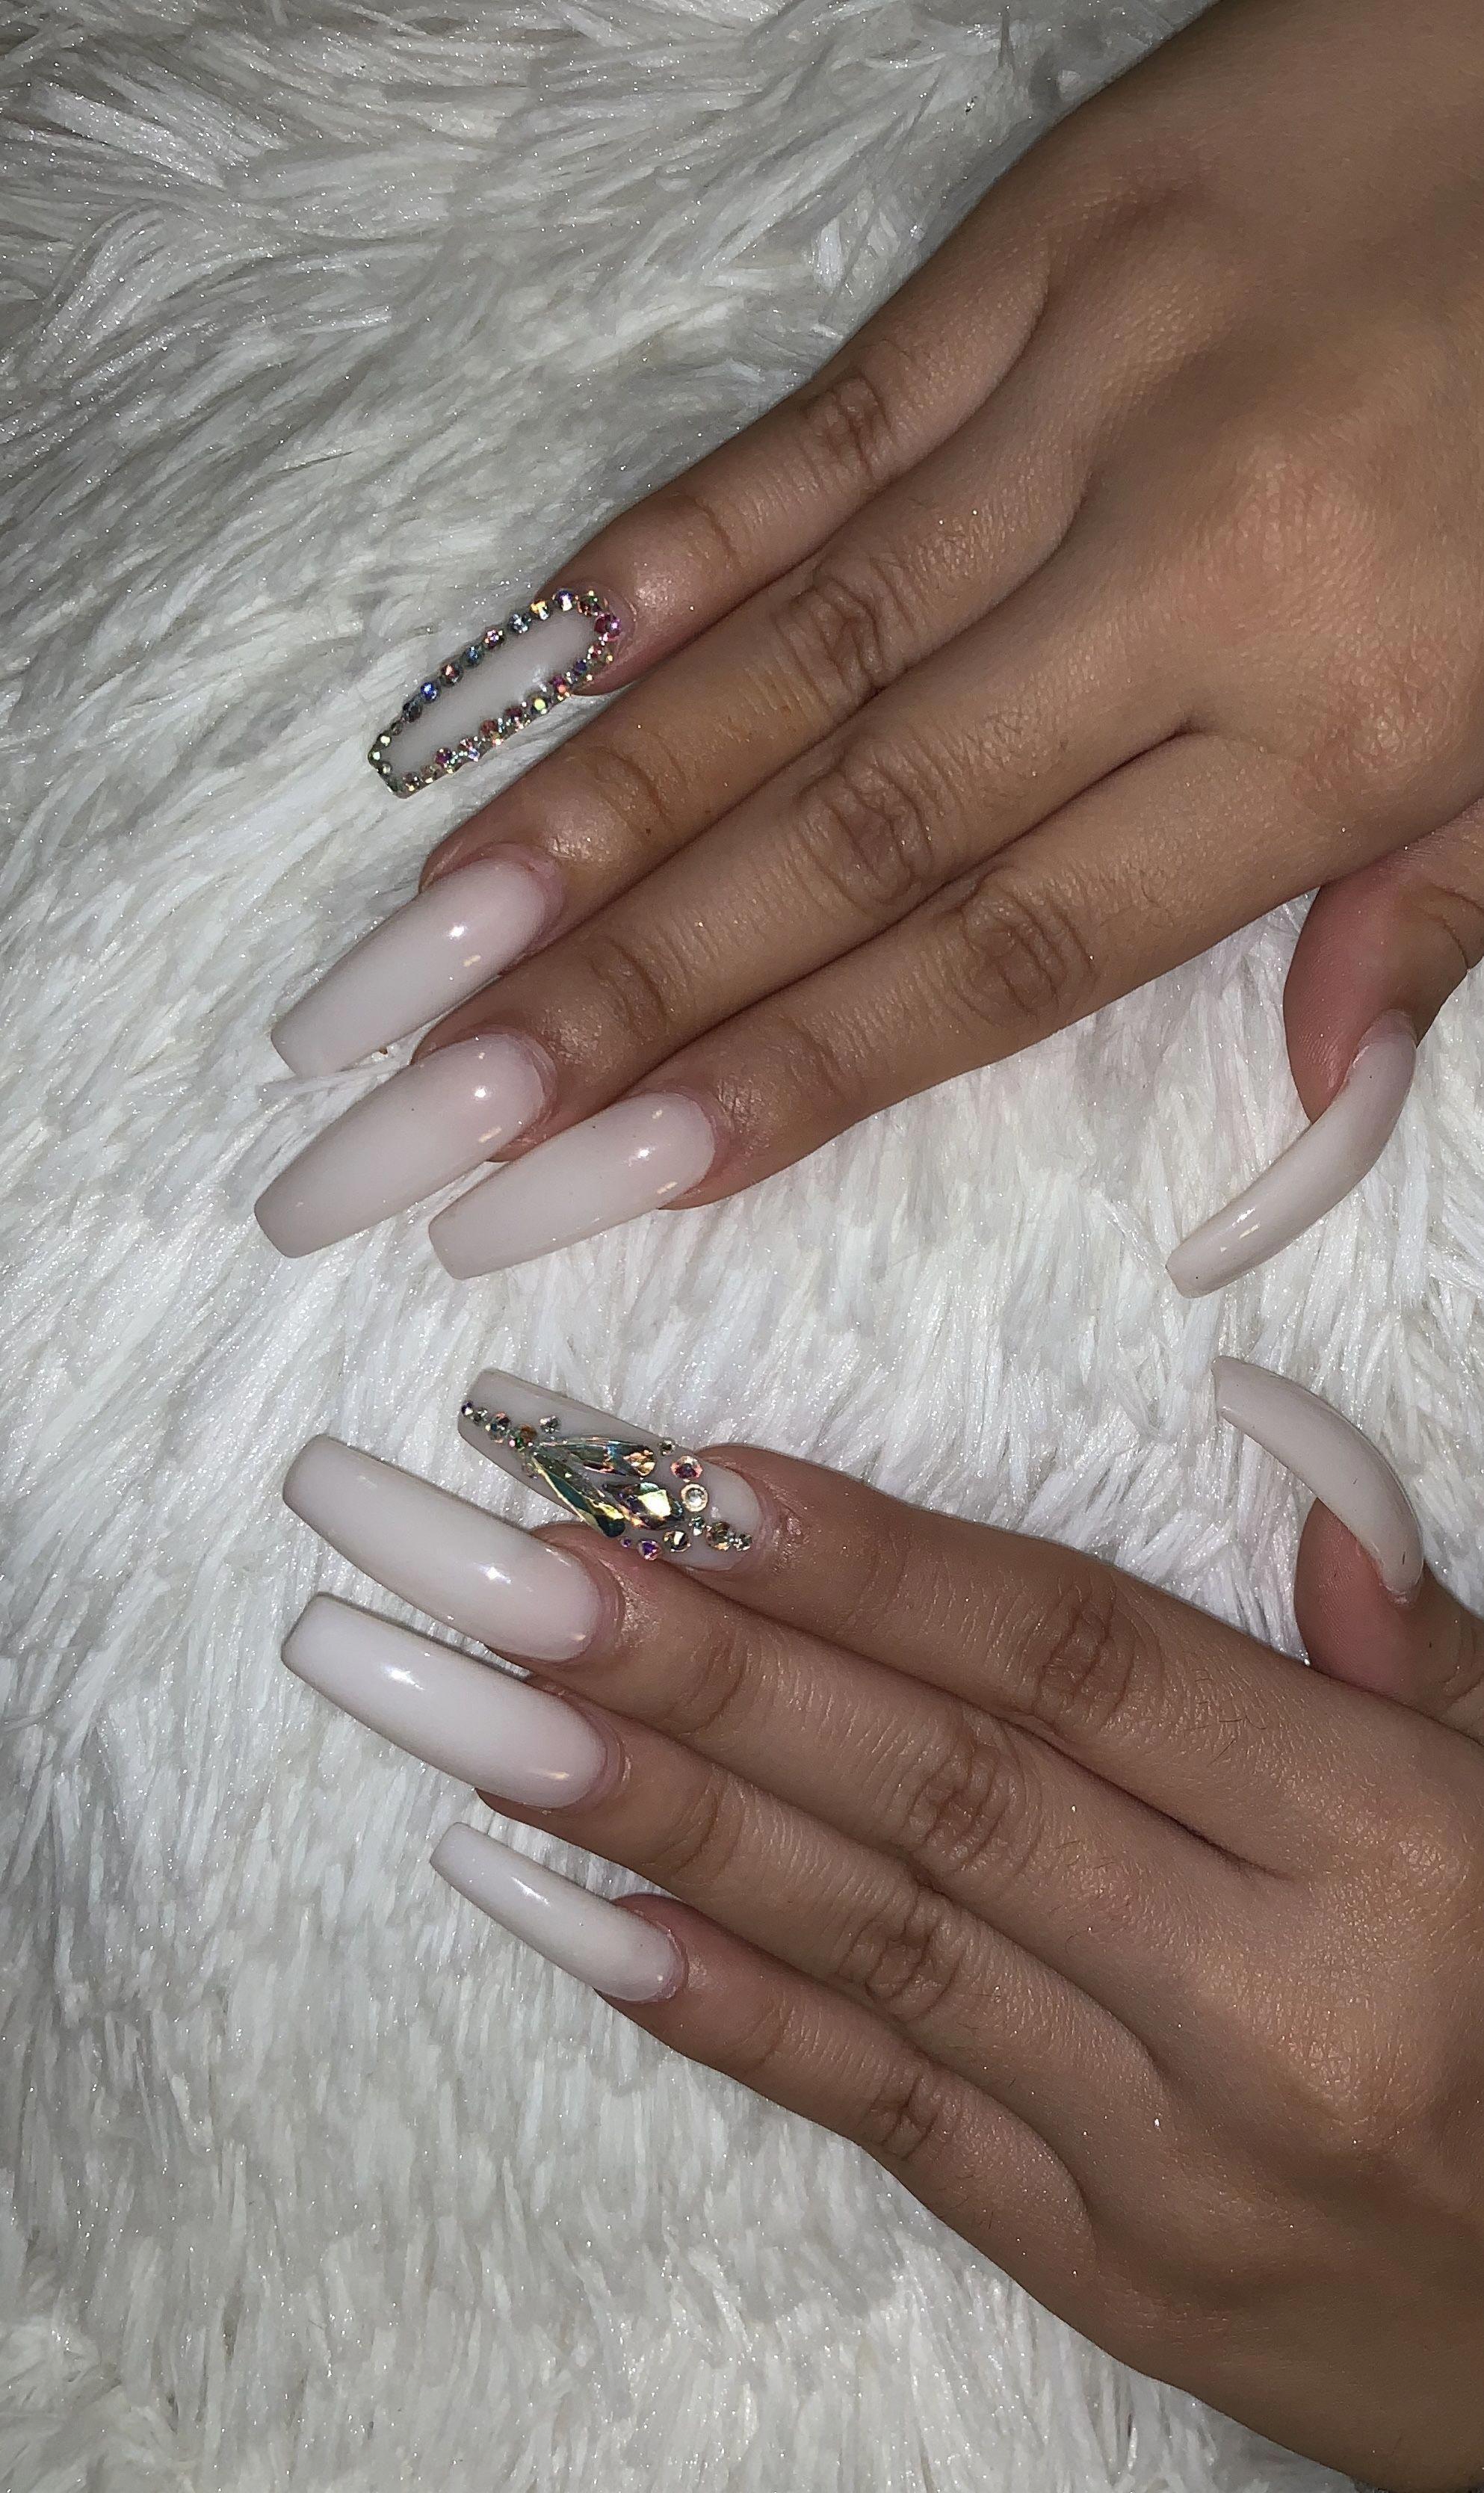 Short Acrylic Nail Art Tips Howlongdoacrylicnailslast Long Acrylic Nails Coffin White Acrylic Nails Long Acrylic Nails